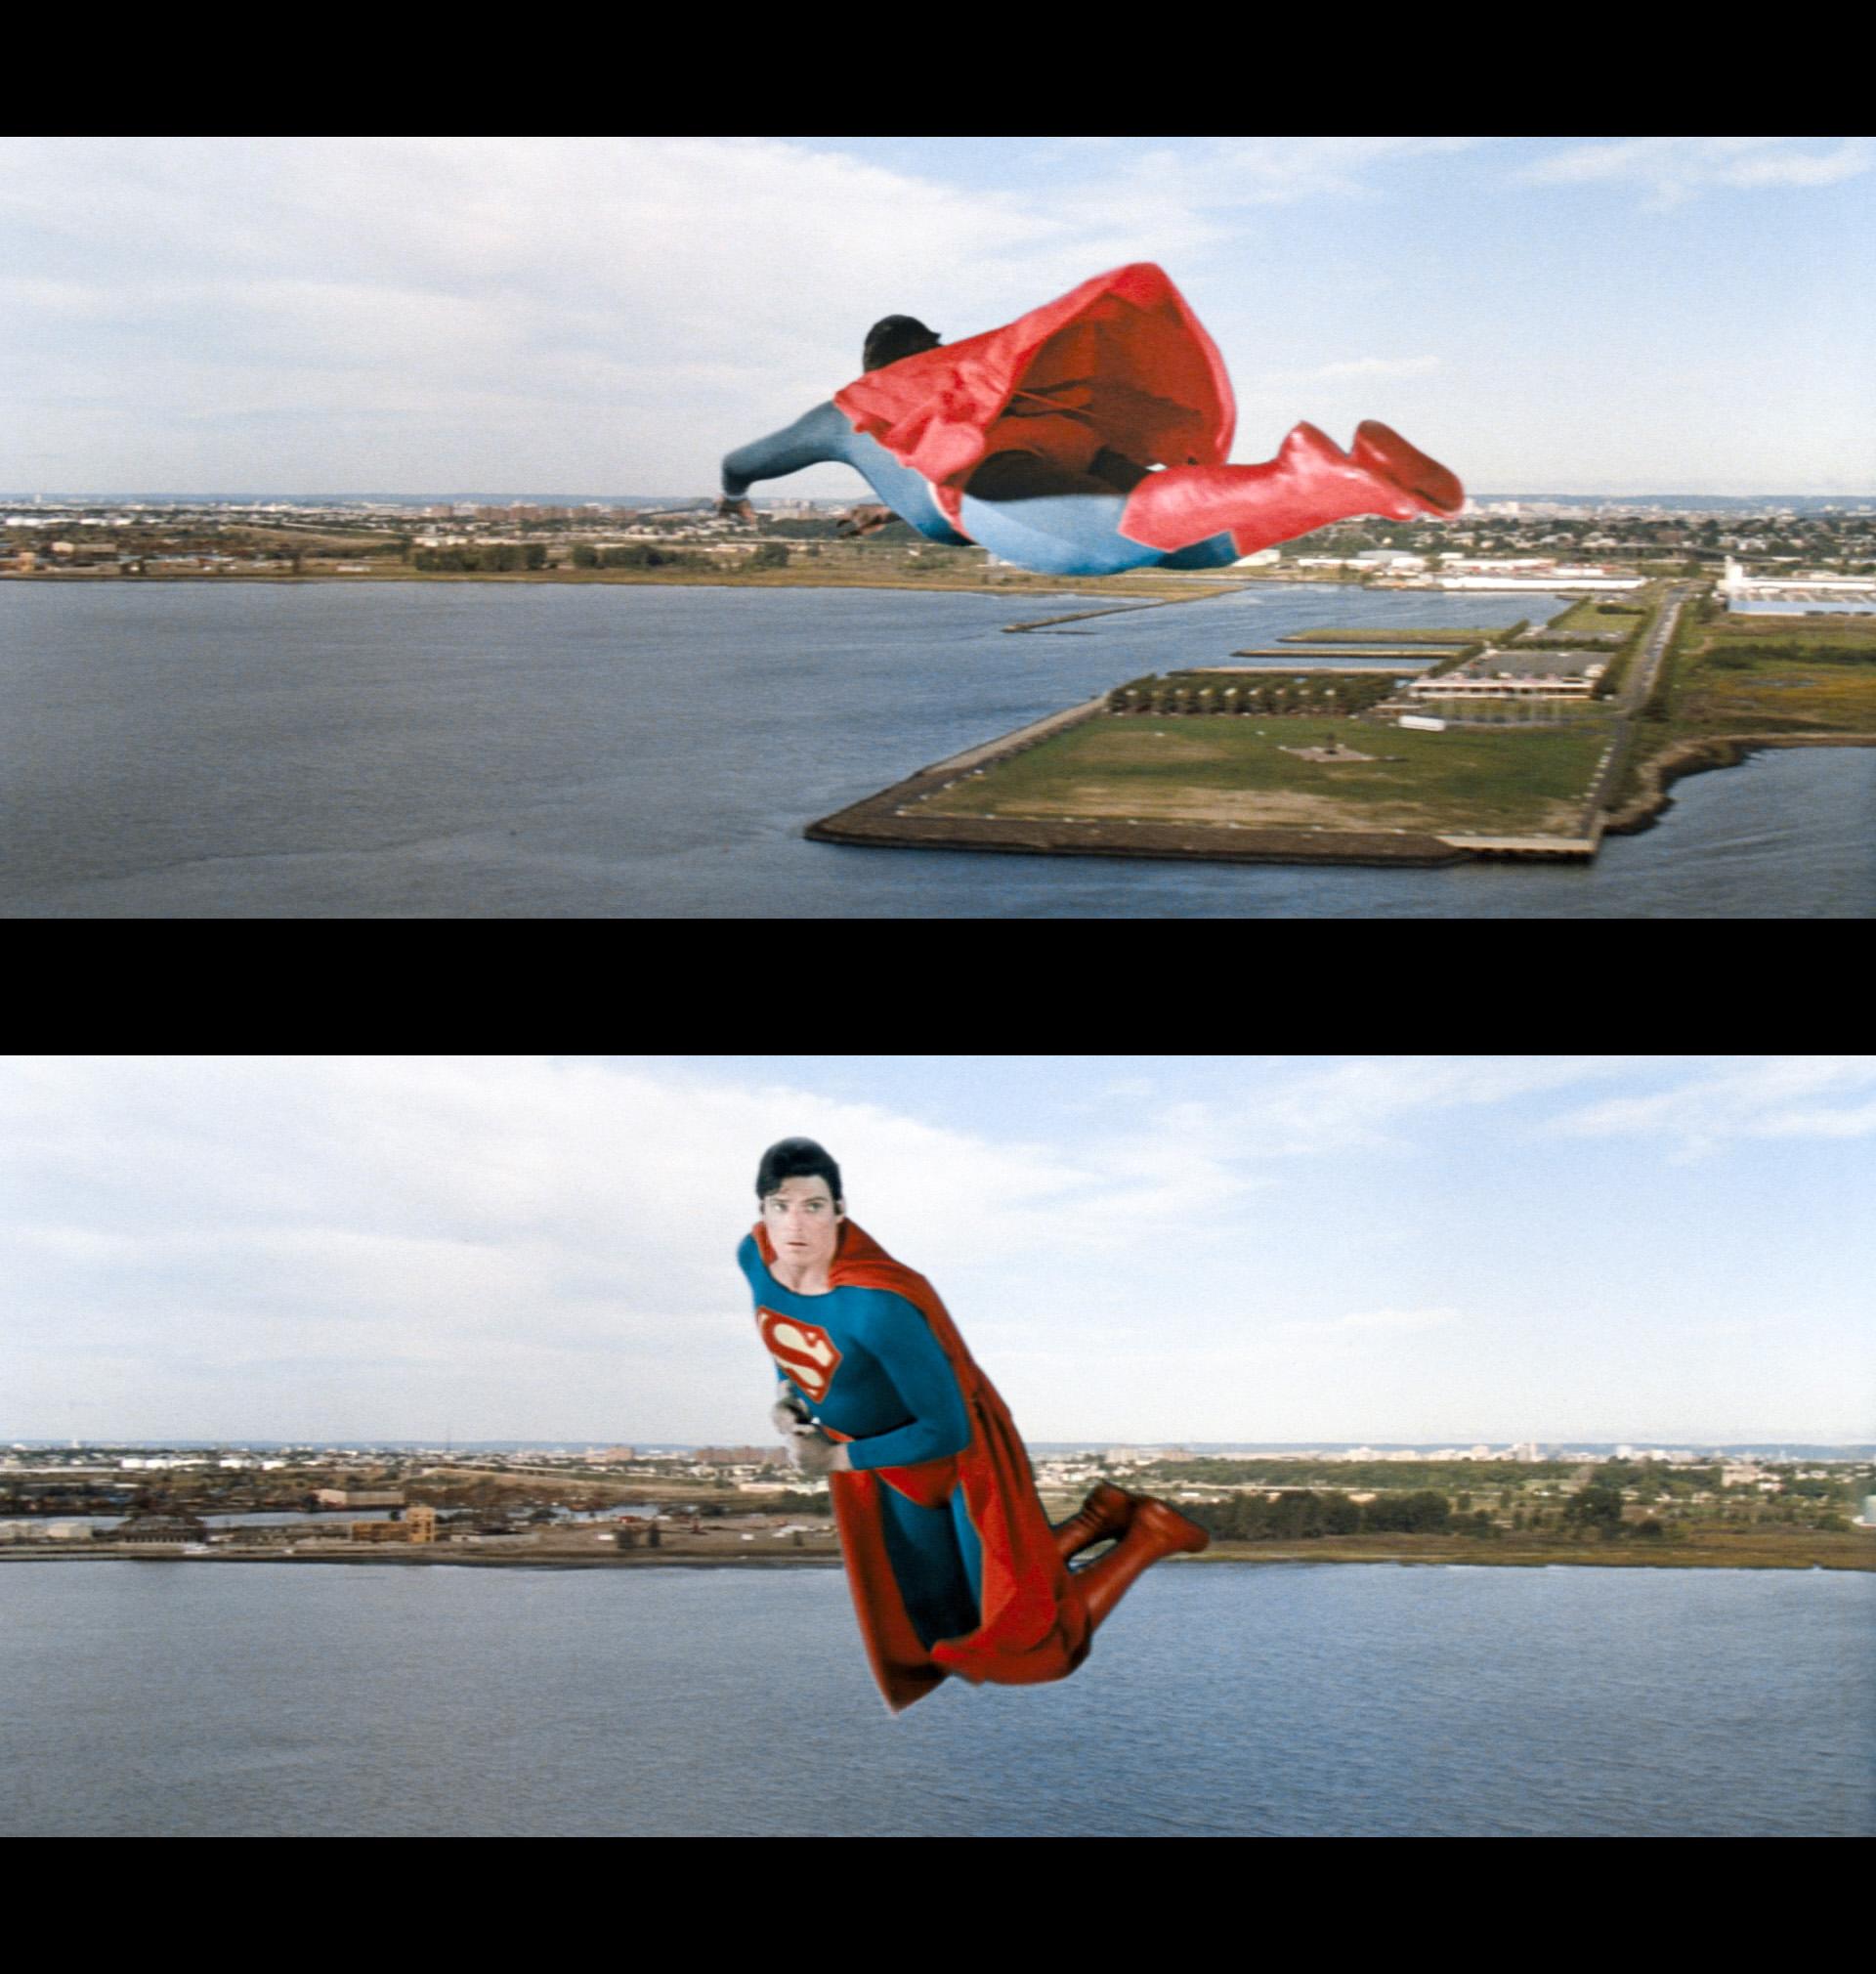 CW-SIV-Superman78-2-screenshot-references